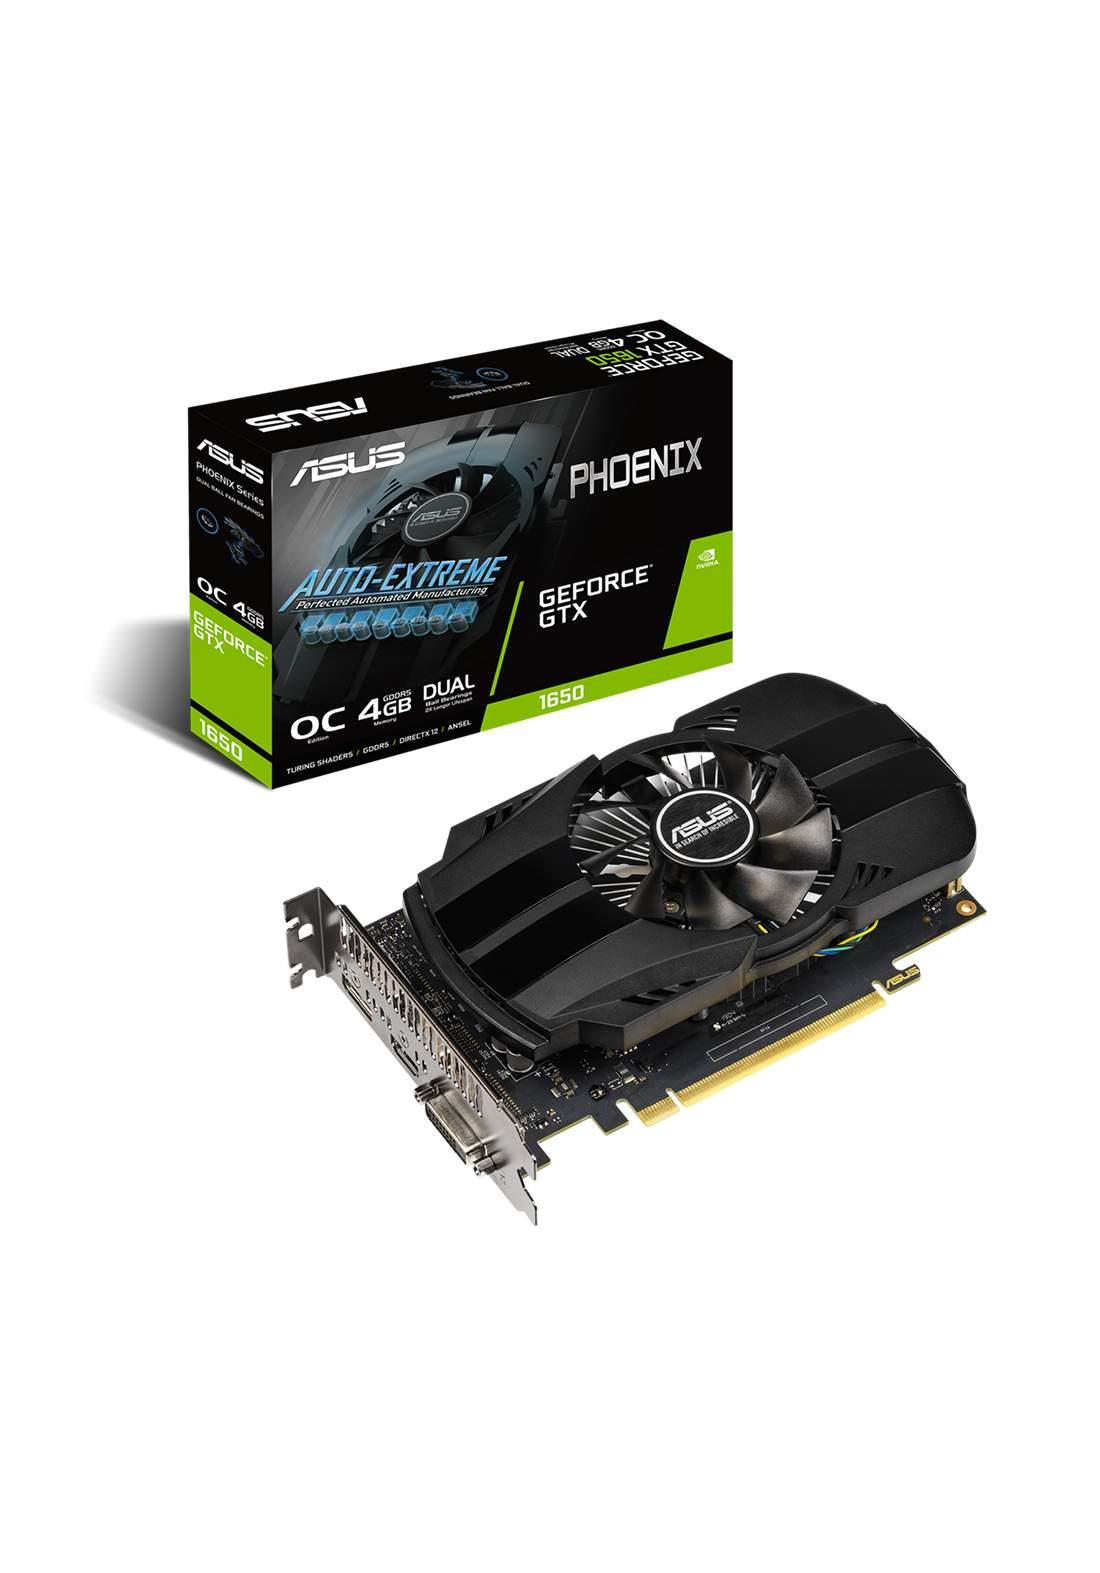 Asus phoenix 1650 GeForce 4GB Graphics Card